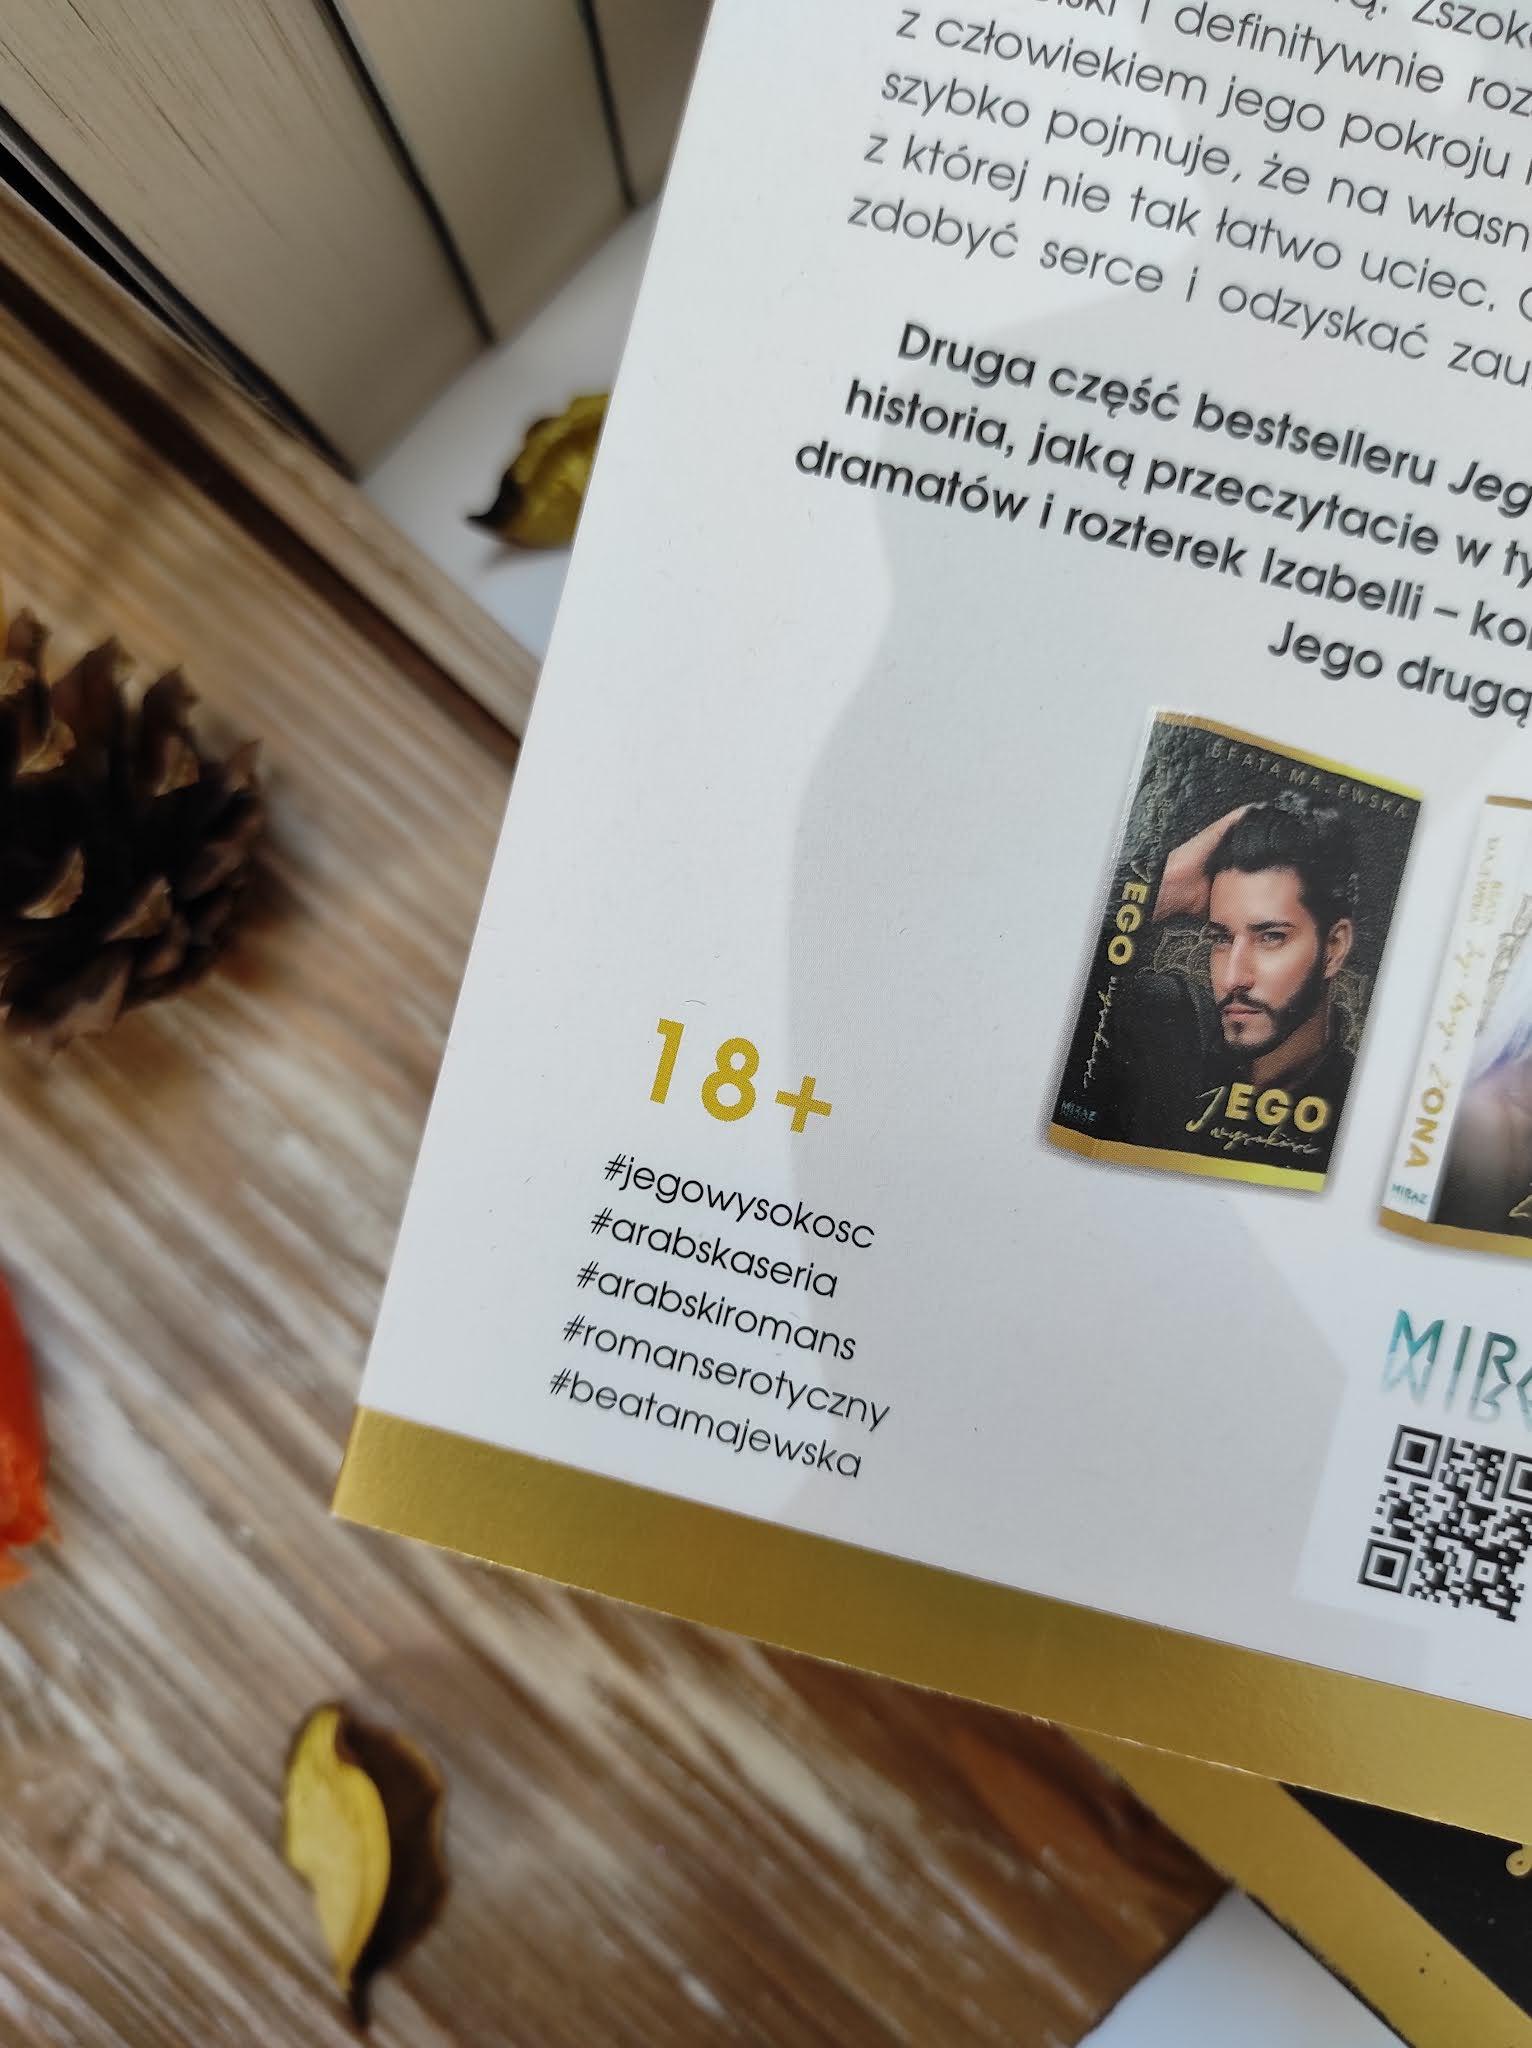 """Jego druga żona"" Beata Majewska - recenzja Patronat Medialny"